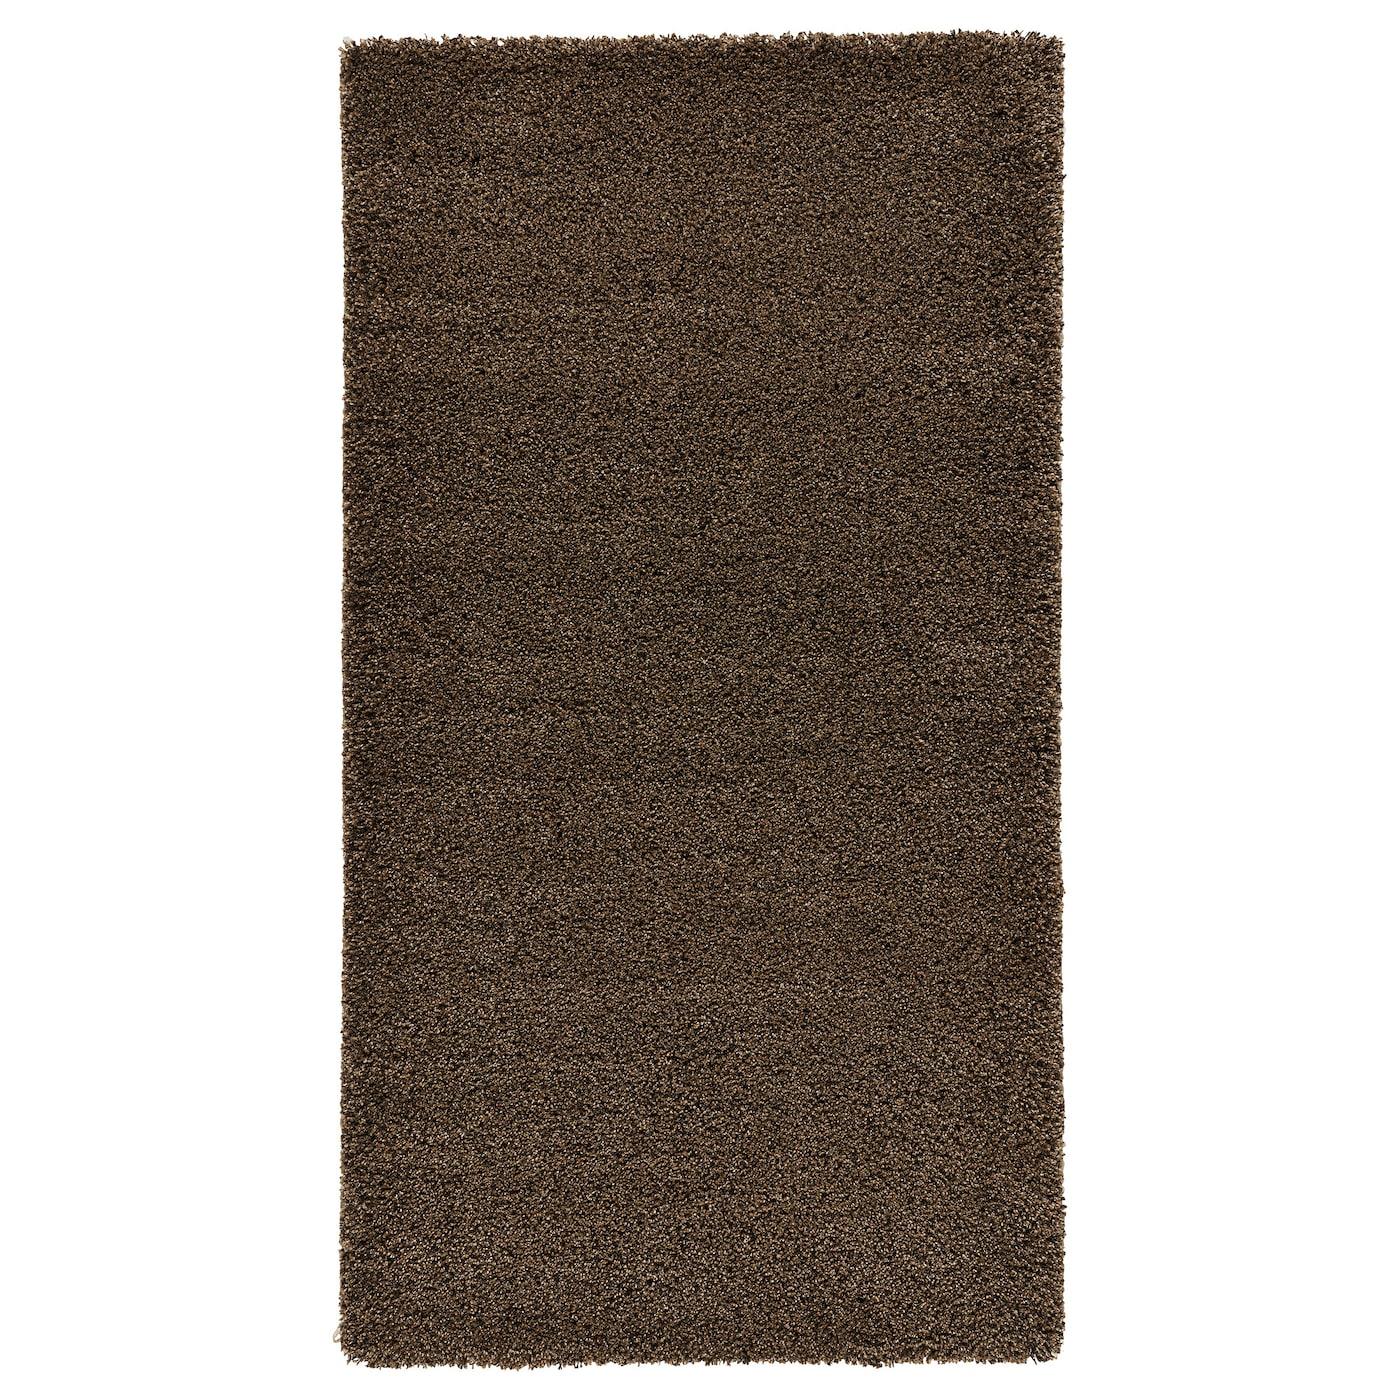 dum tapis poils hauts brun clair 80x150 cm ikea. Black Bedroom Furniture Sets. Home Design Ideas